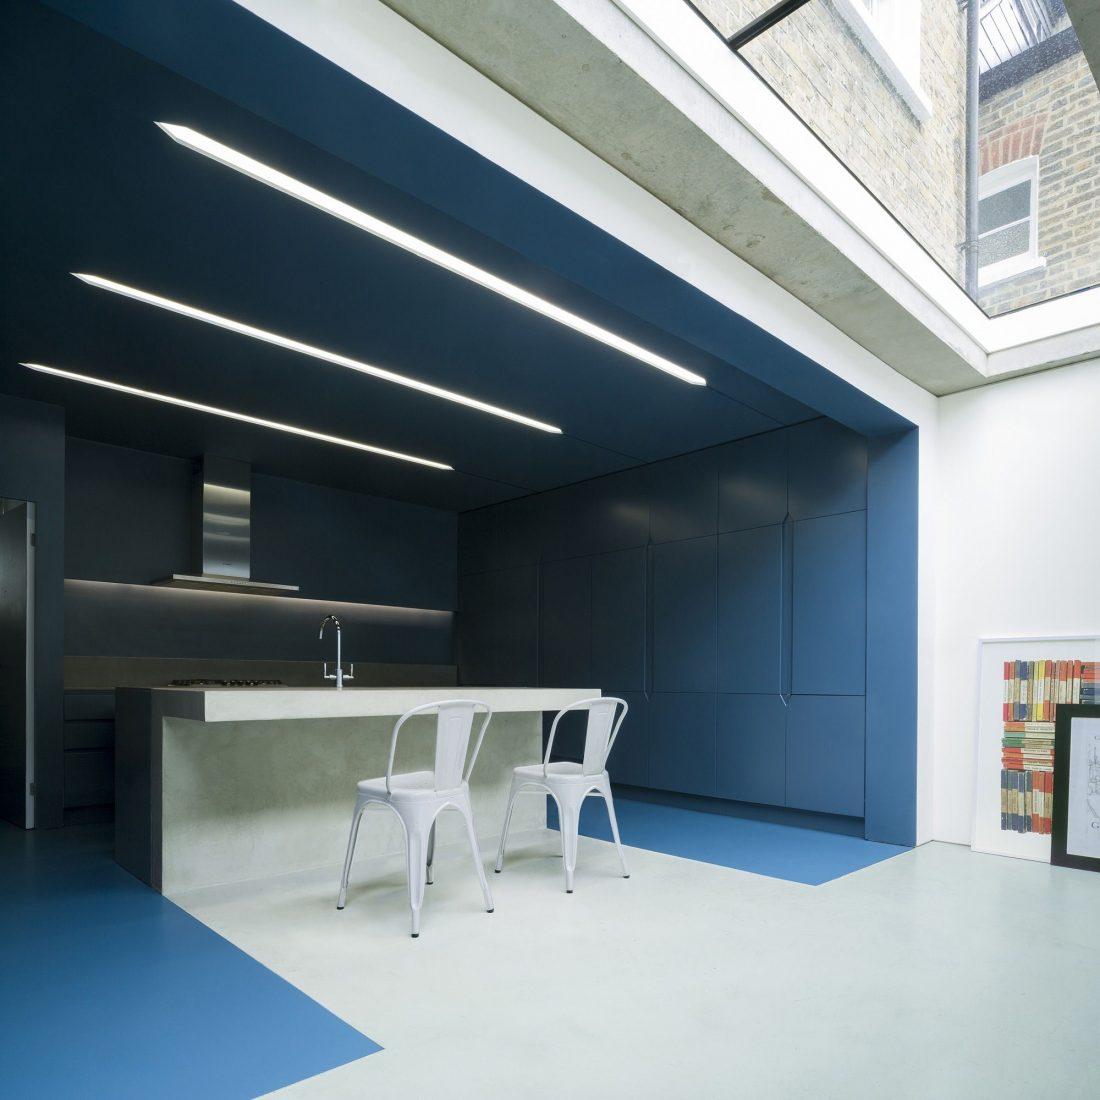 dinamika-i-obem-v-predelah-50-metrov-proekt-bureau-de-change-architects-3